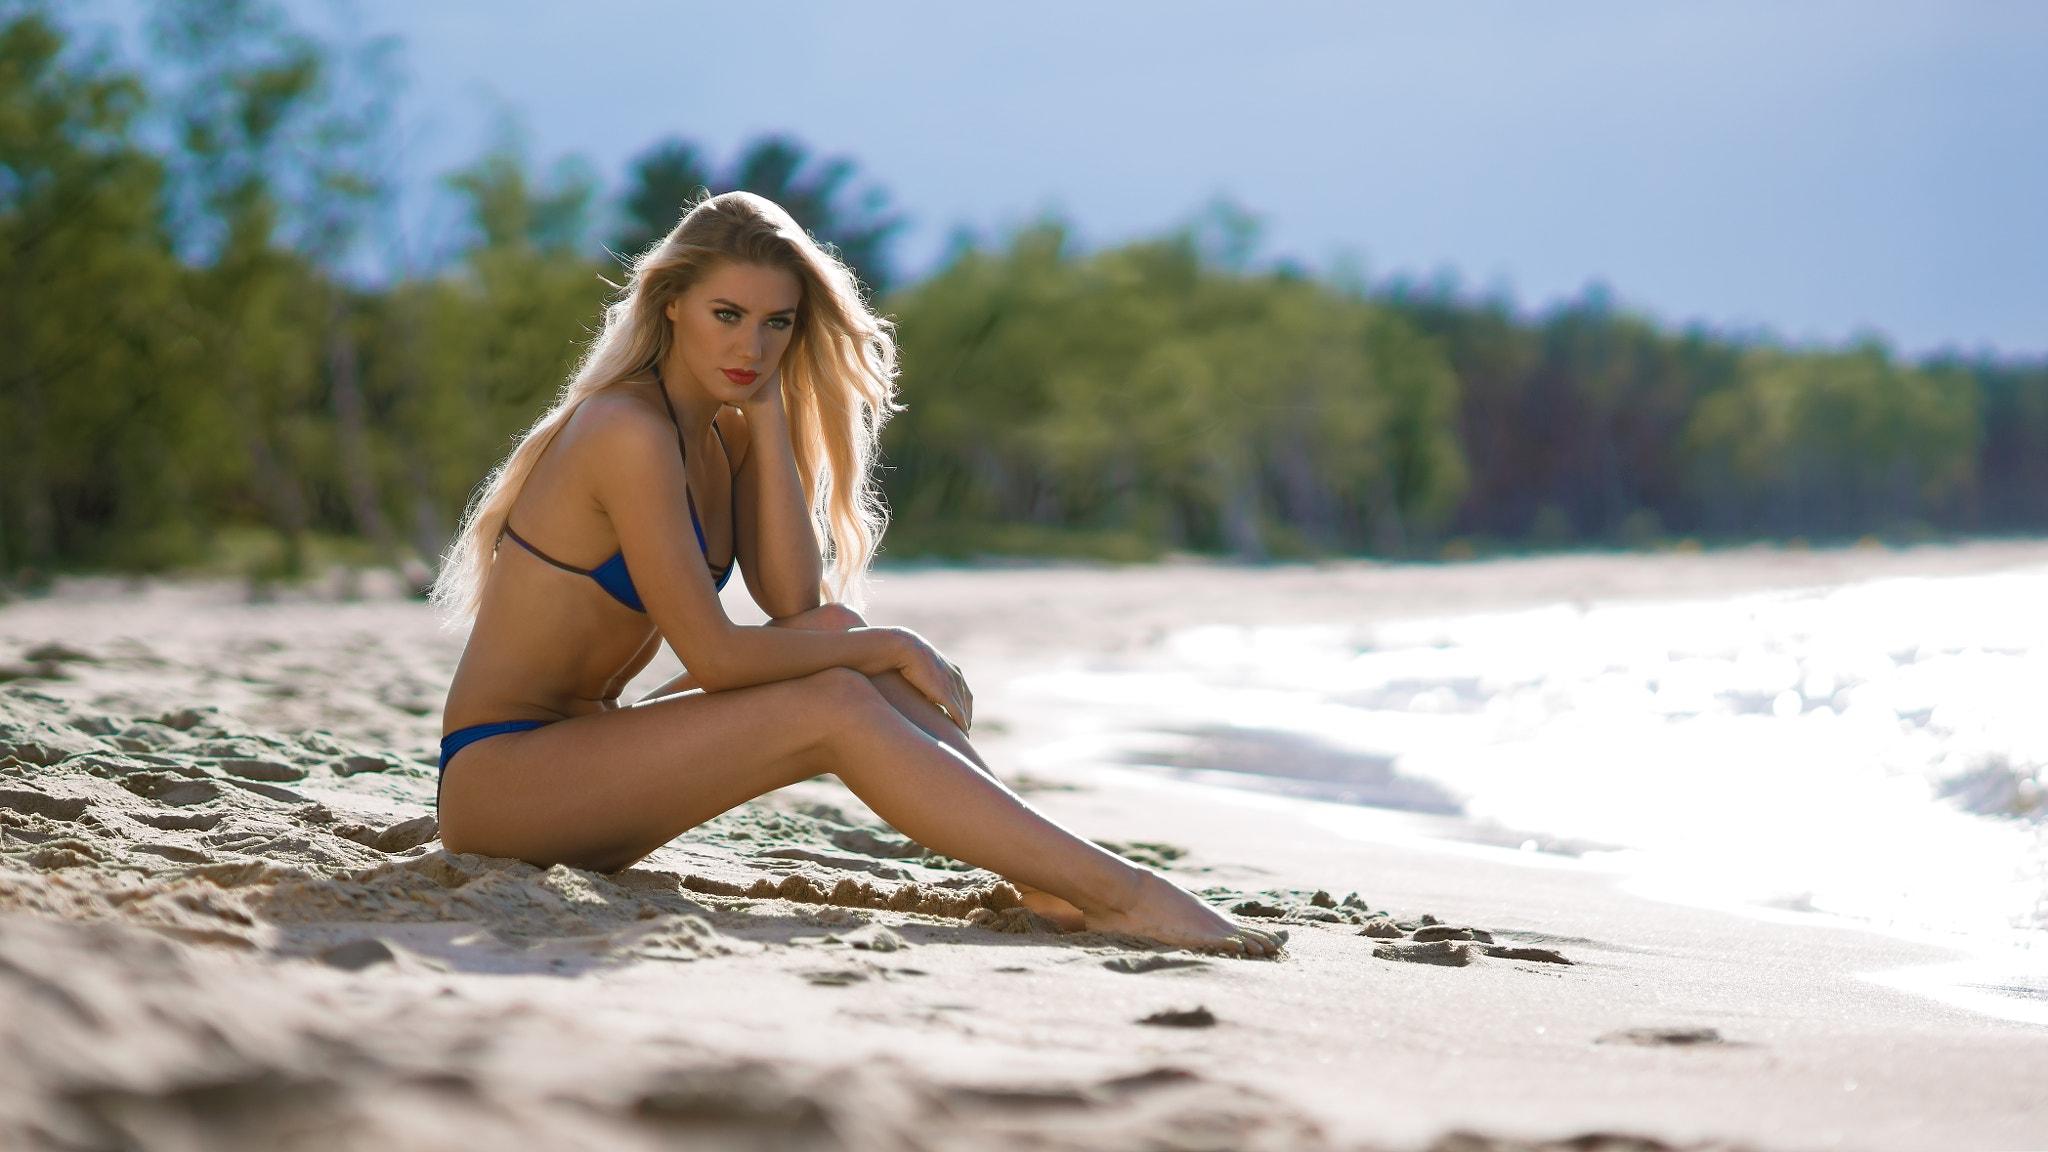 wallpaper : blonde, legs, beach, sand, sitting, blue bras, blue